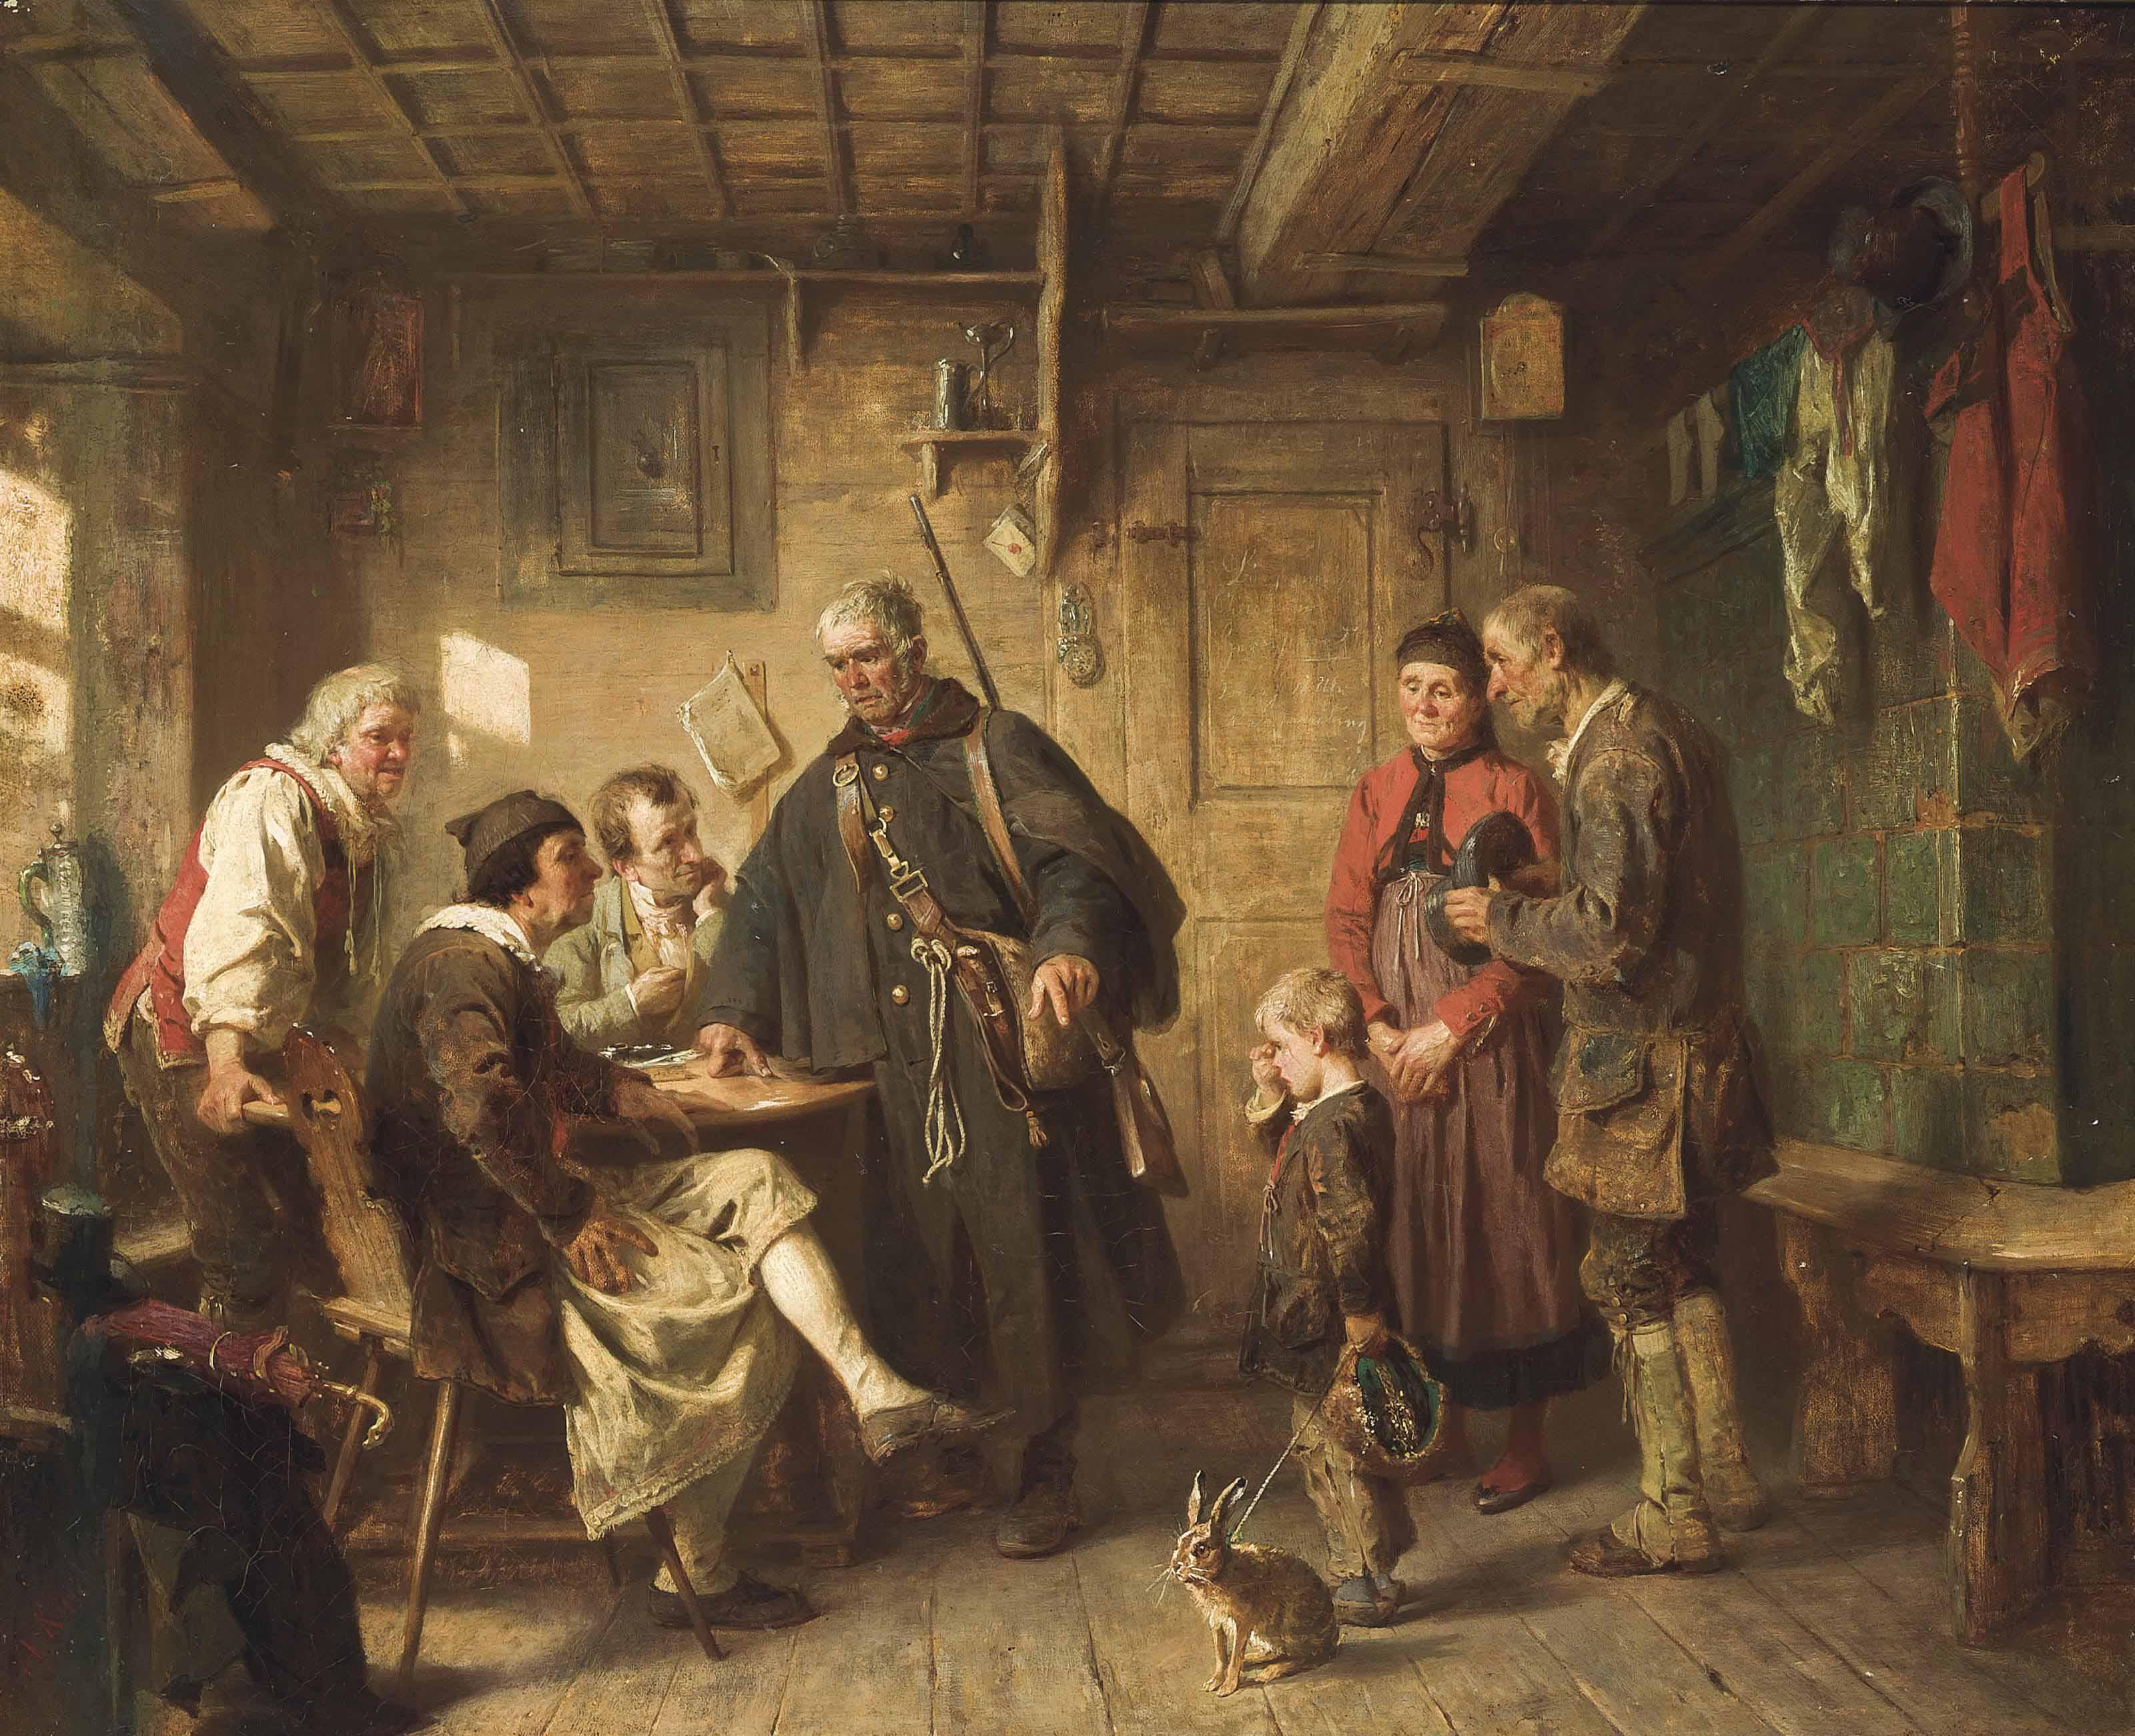 Albert Kindler (GERMAN, 1833-1876)